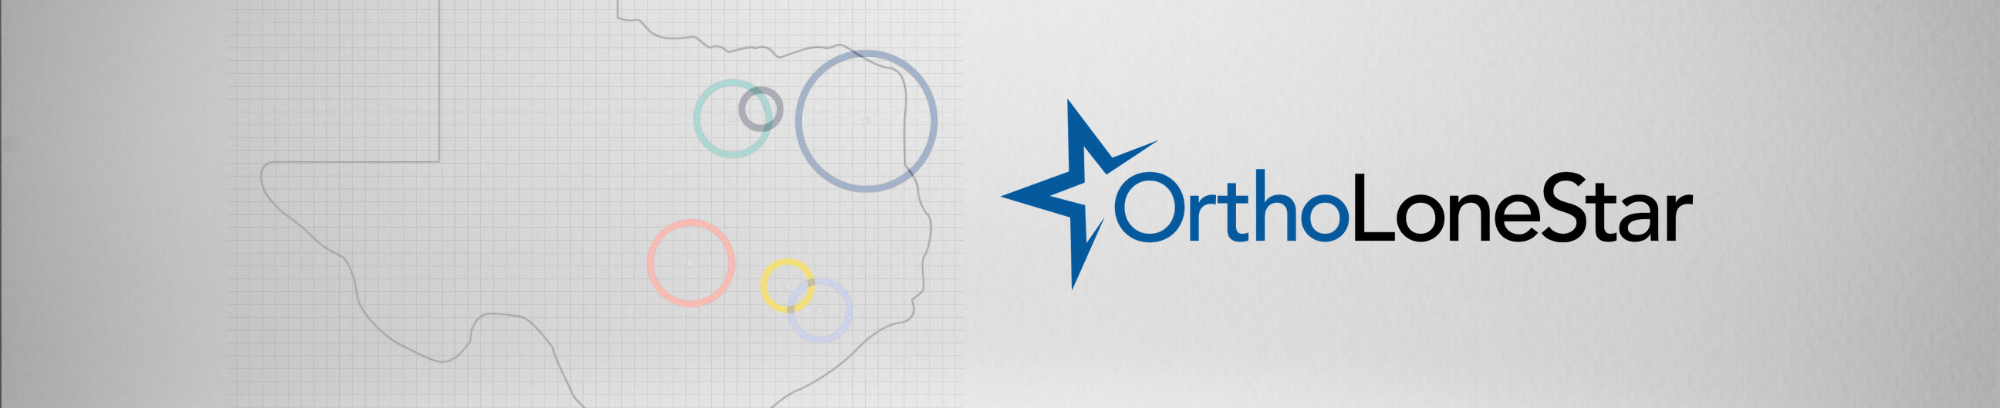 "<img src=""OrthoLoneStar.jpg"" alt=""orthopedic practice at Texas Orthopedics, Sports & Rehabilitation Associates"" />"